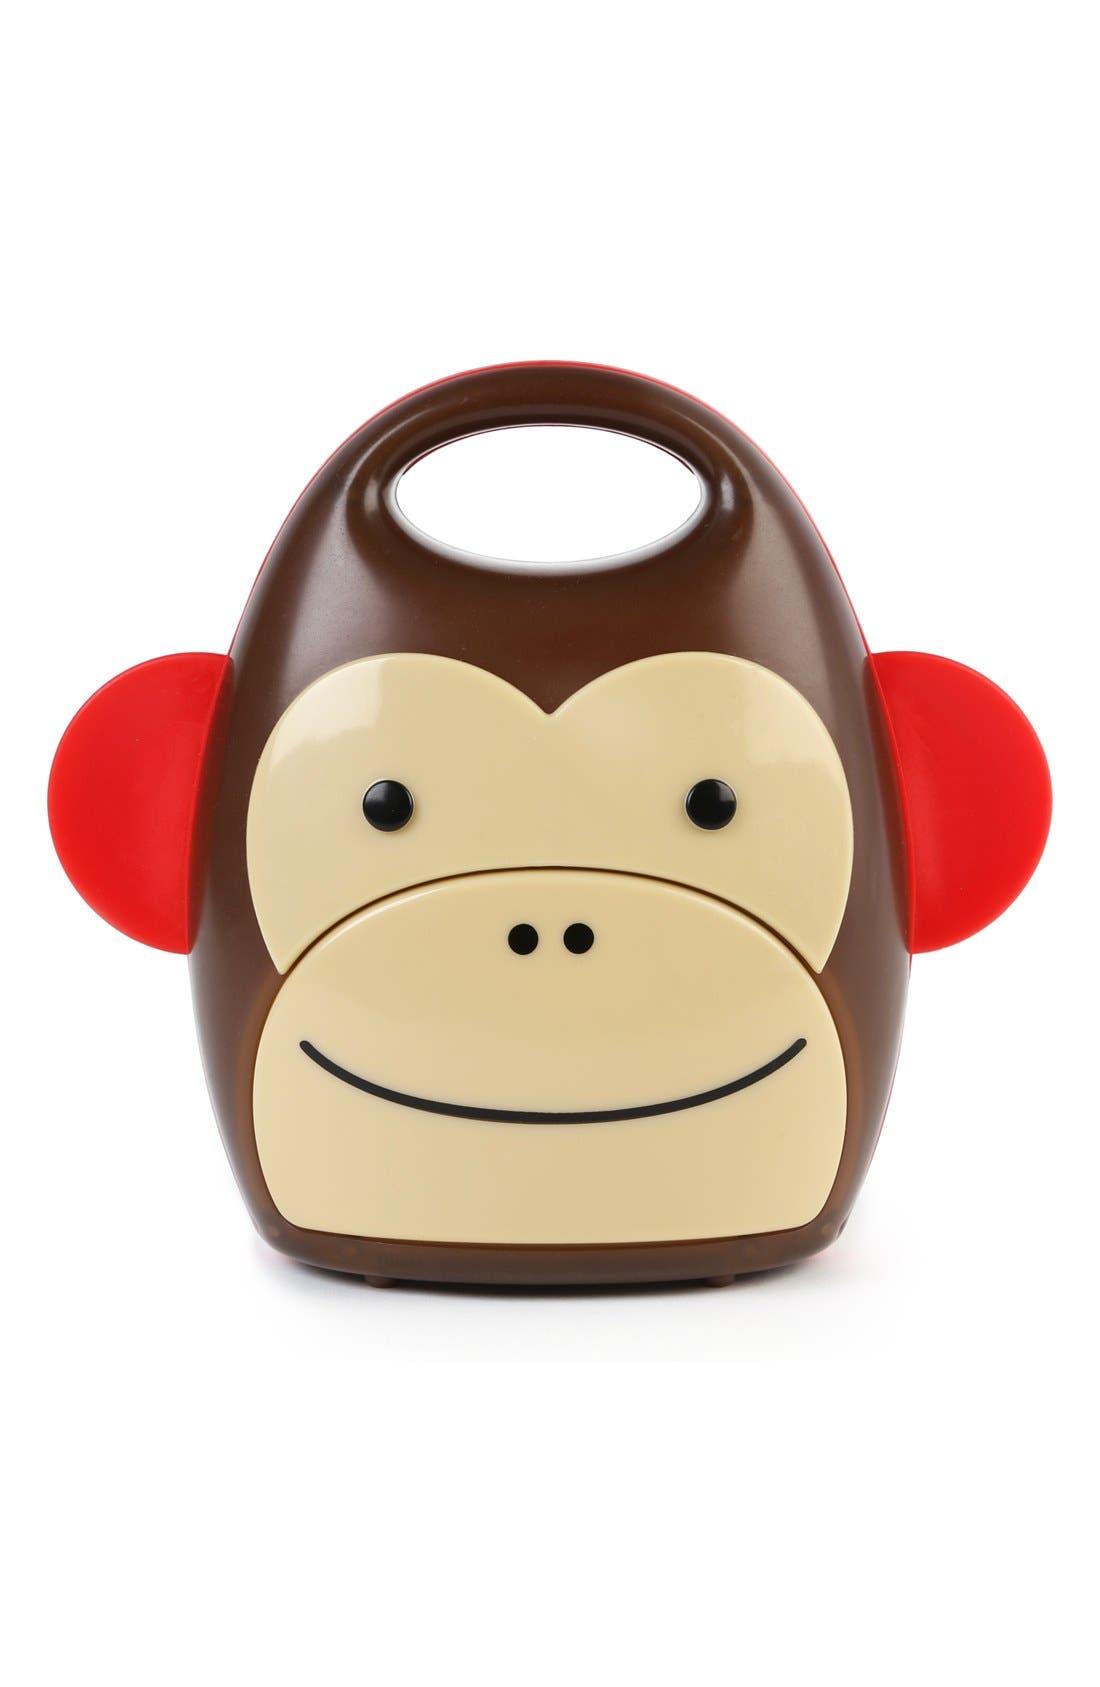 'Zoo - Monkey' Portable Cord Free Nightlight,                             Main thumbnail 1, color,                             200